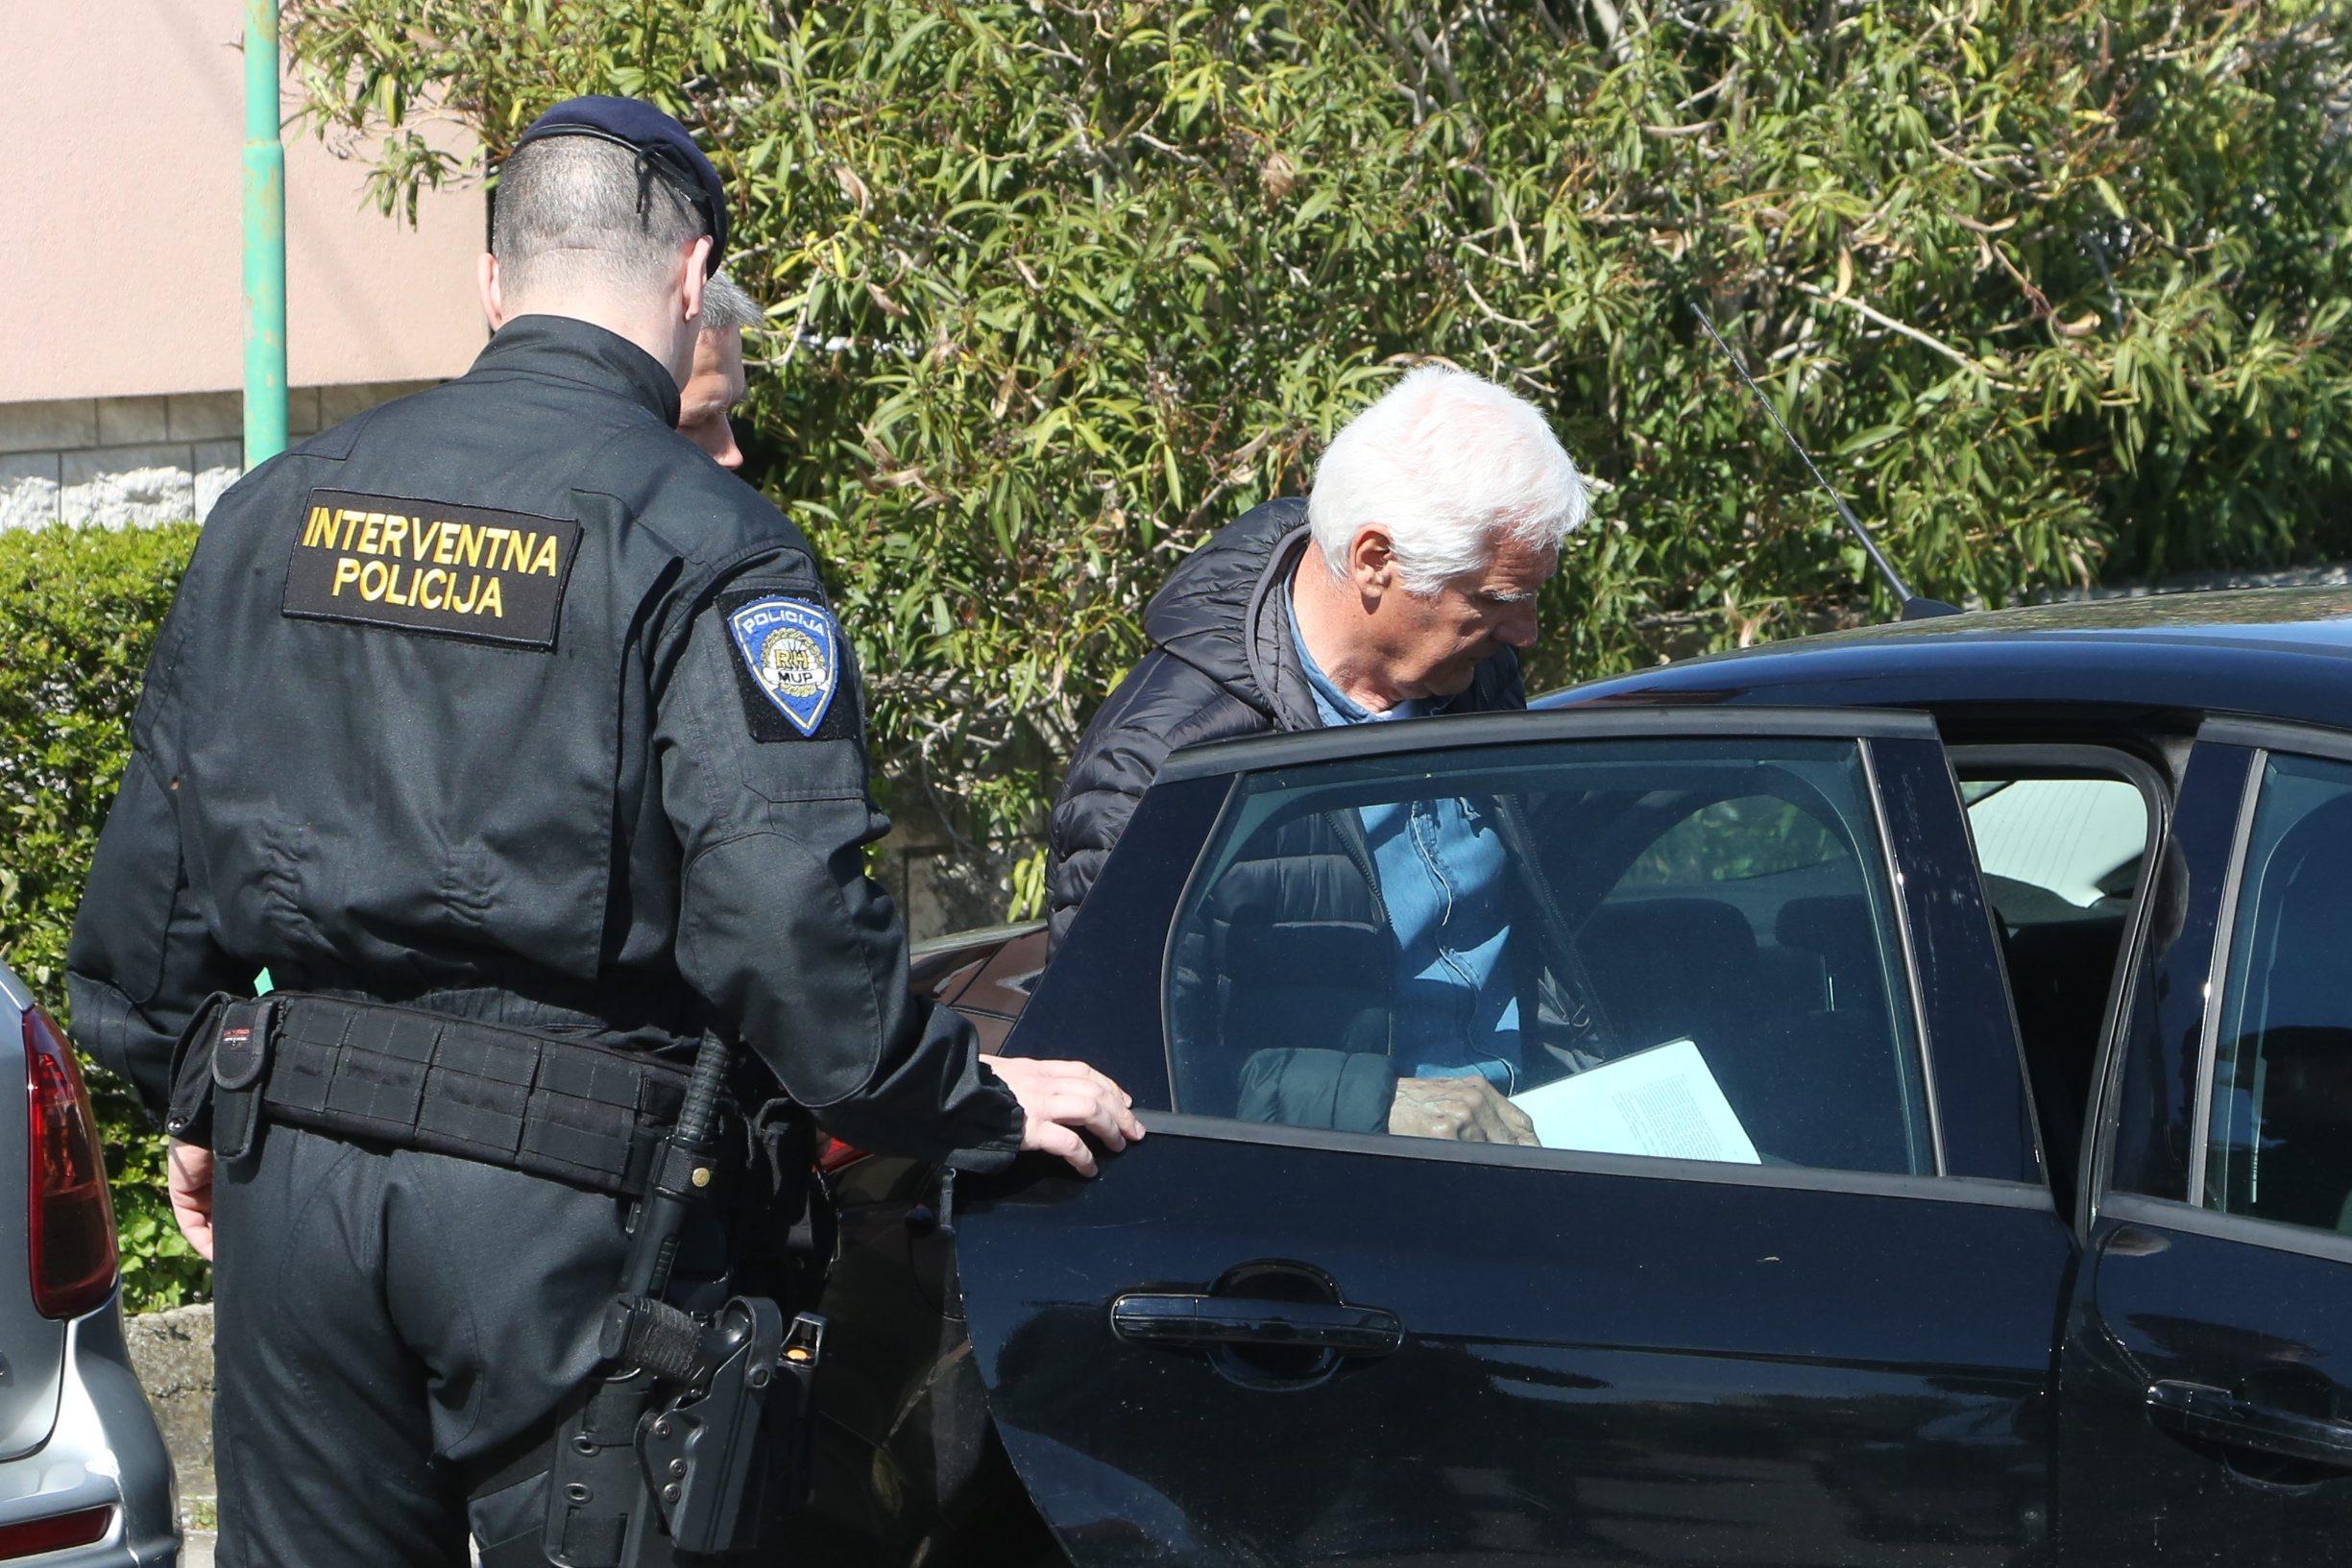 Interventna policija privodi bivšeg čelnika Uljanika Antona Brajkovića